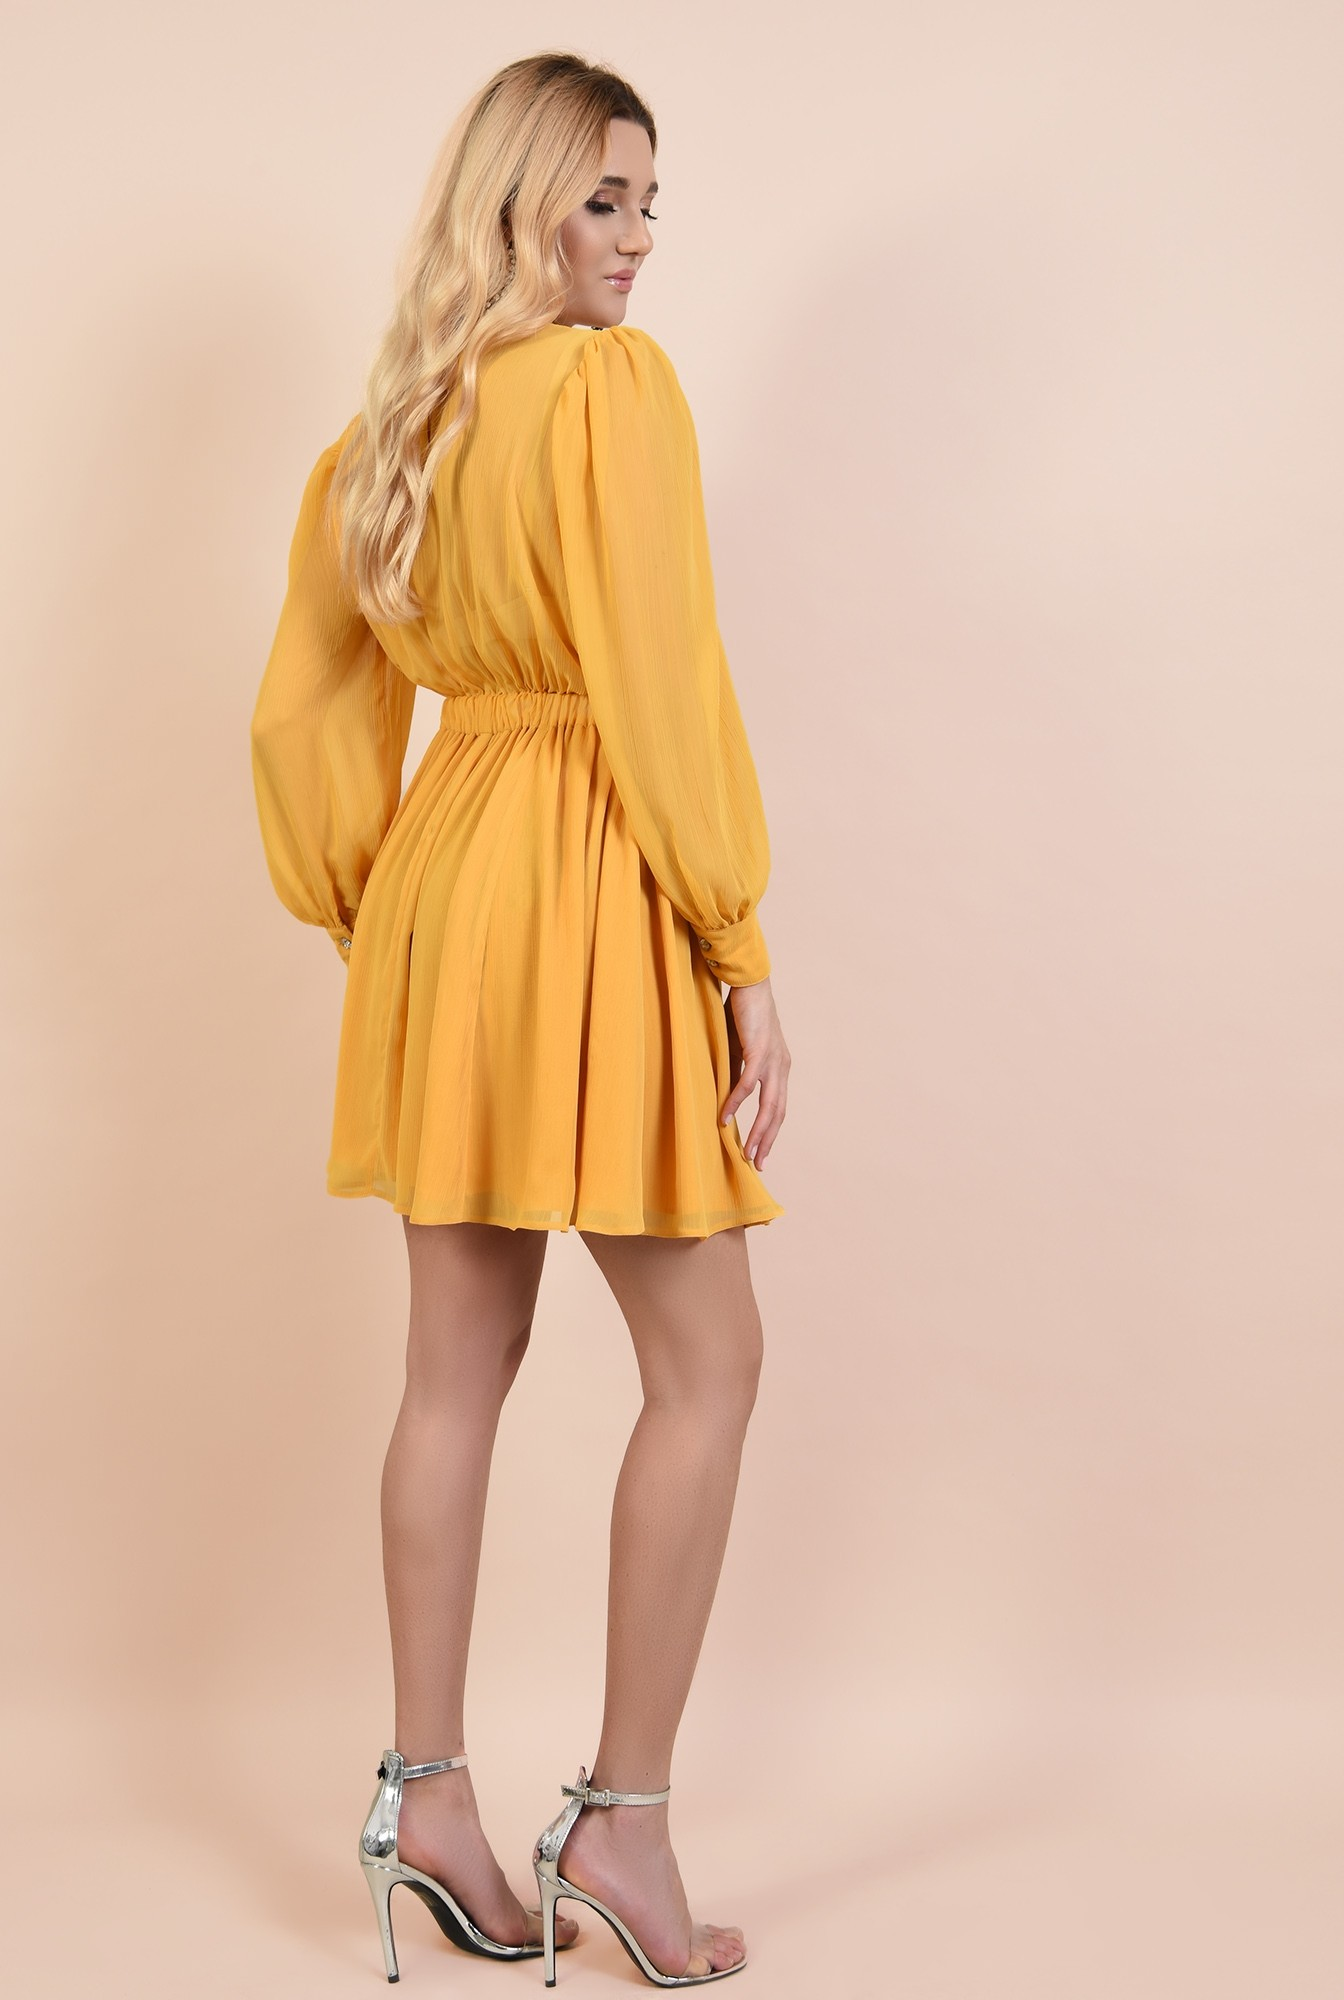 1 - rochie de ocazie, evazata, talie pe elastic, maneci bufante cu manseta